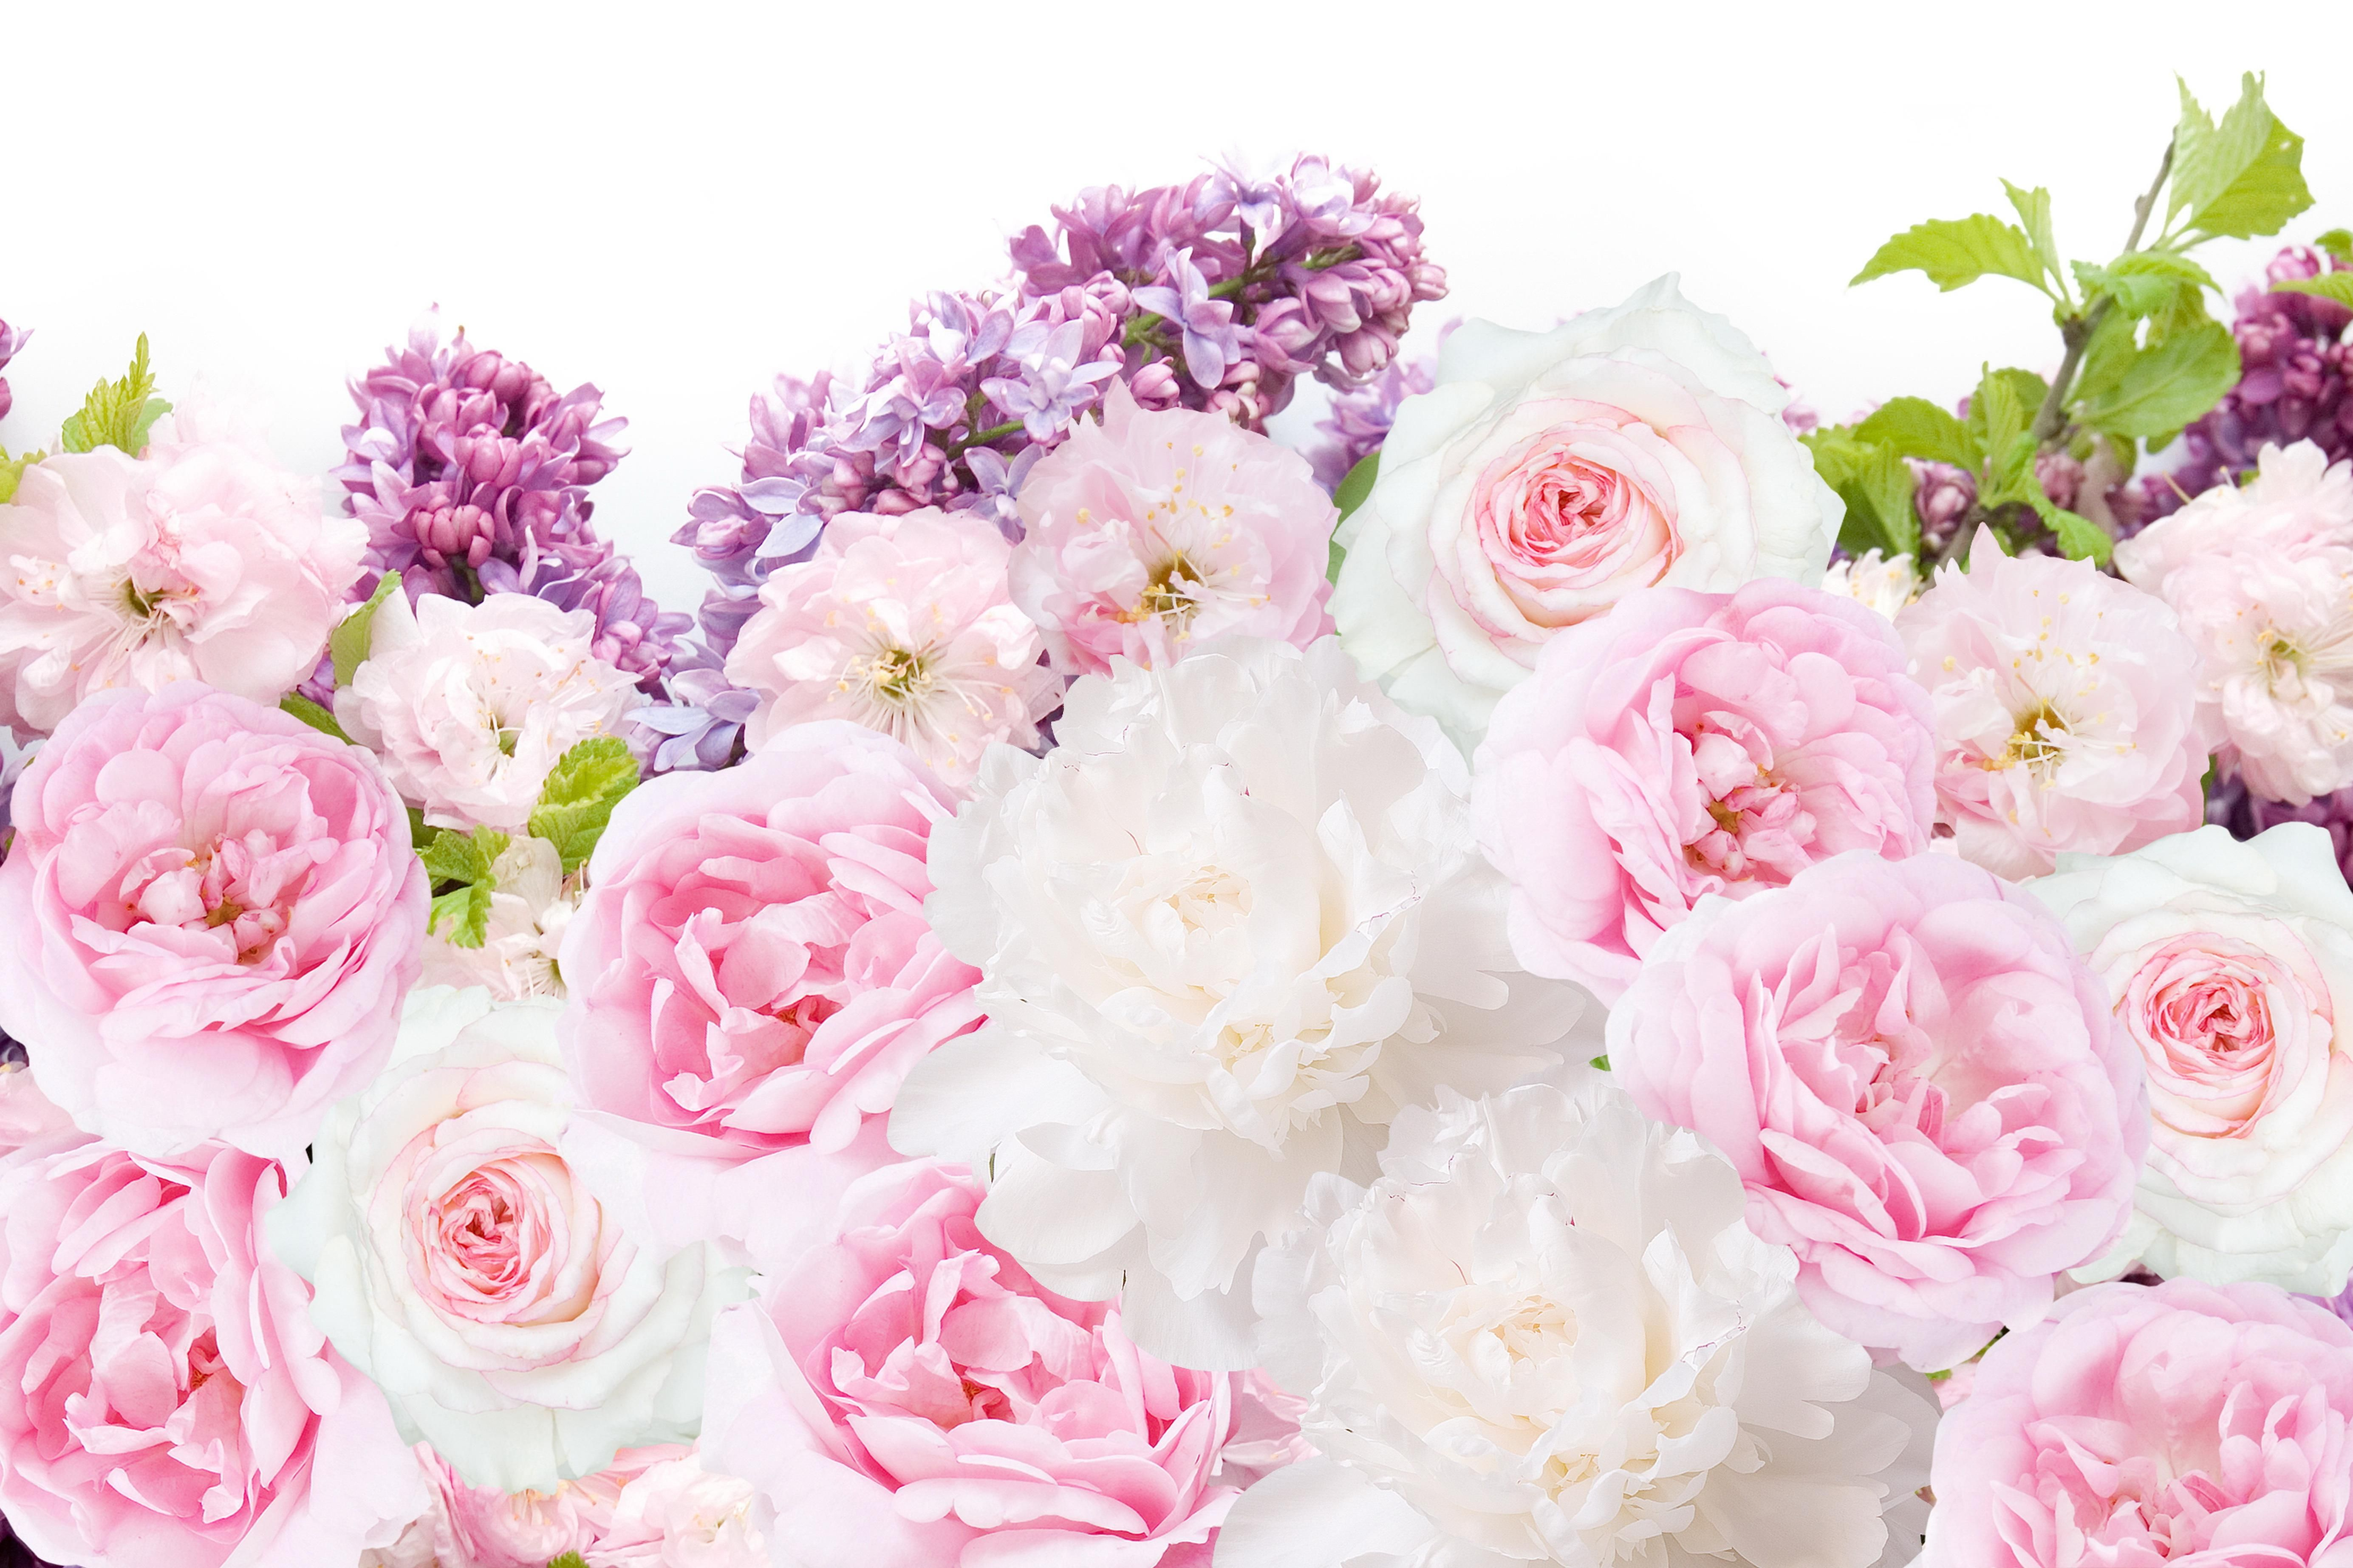 Pink White Peonies Floral Desktop Wallpaper Background Pretty